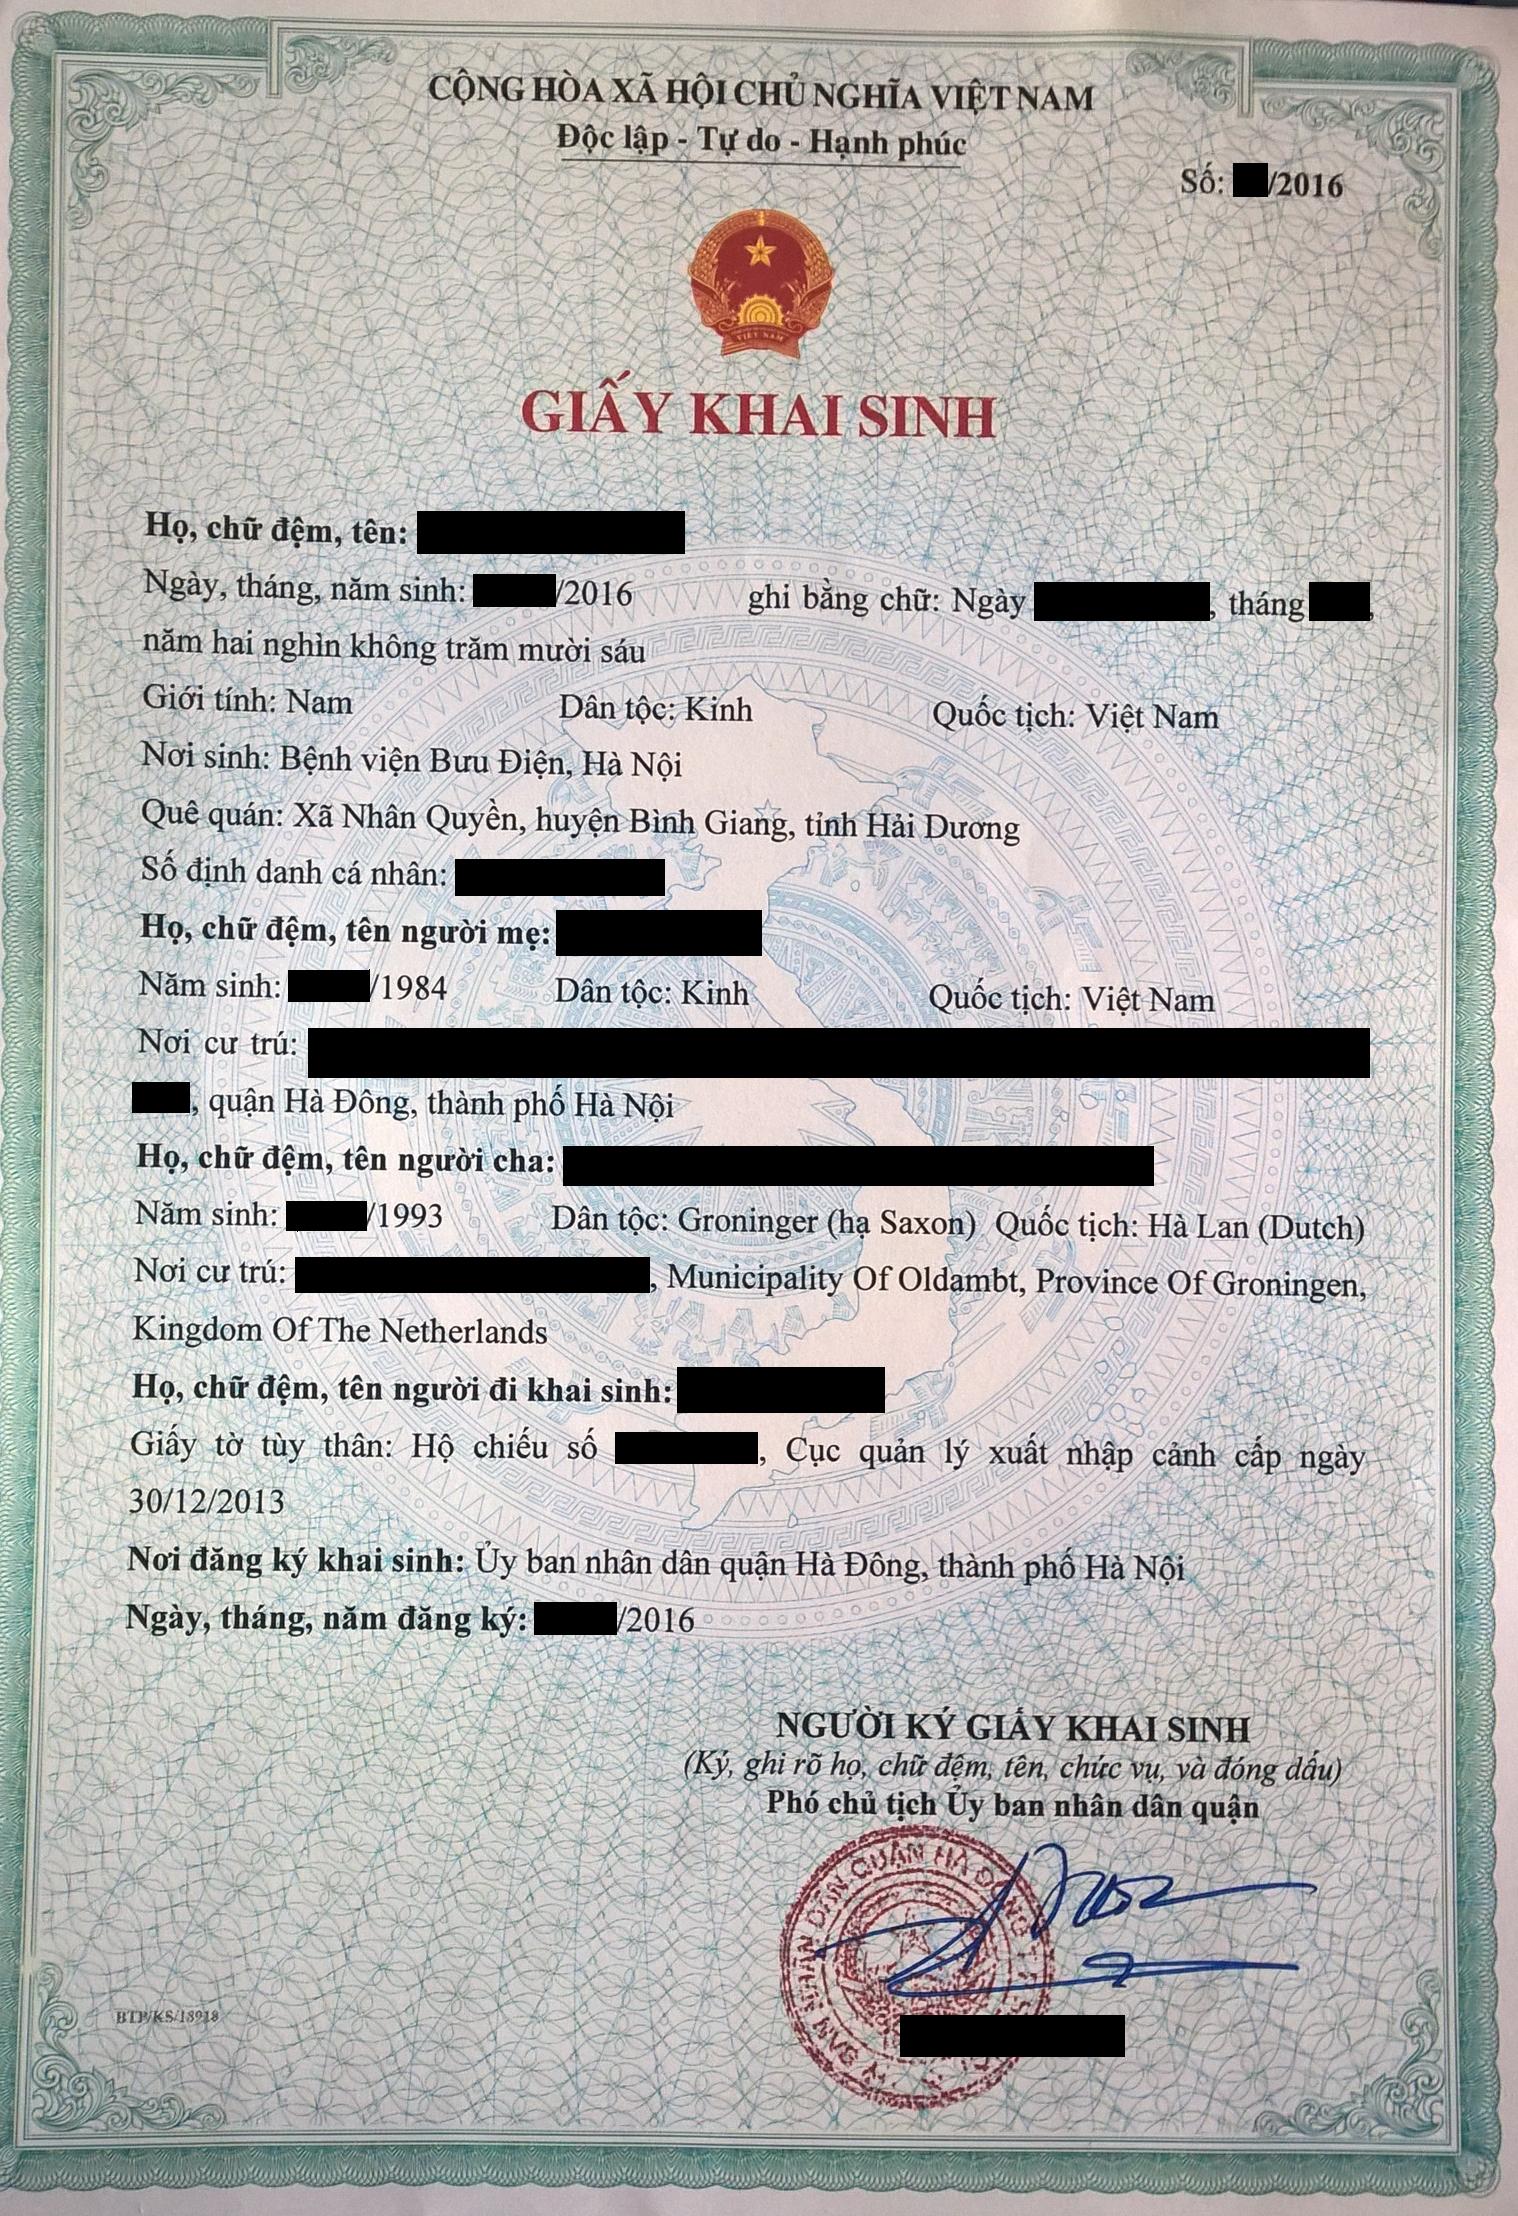 Filevietnamese birth certificate 2016g wikimedia commons filevietnamese birth certificate 2016g aiddatafo Gallery